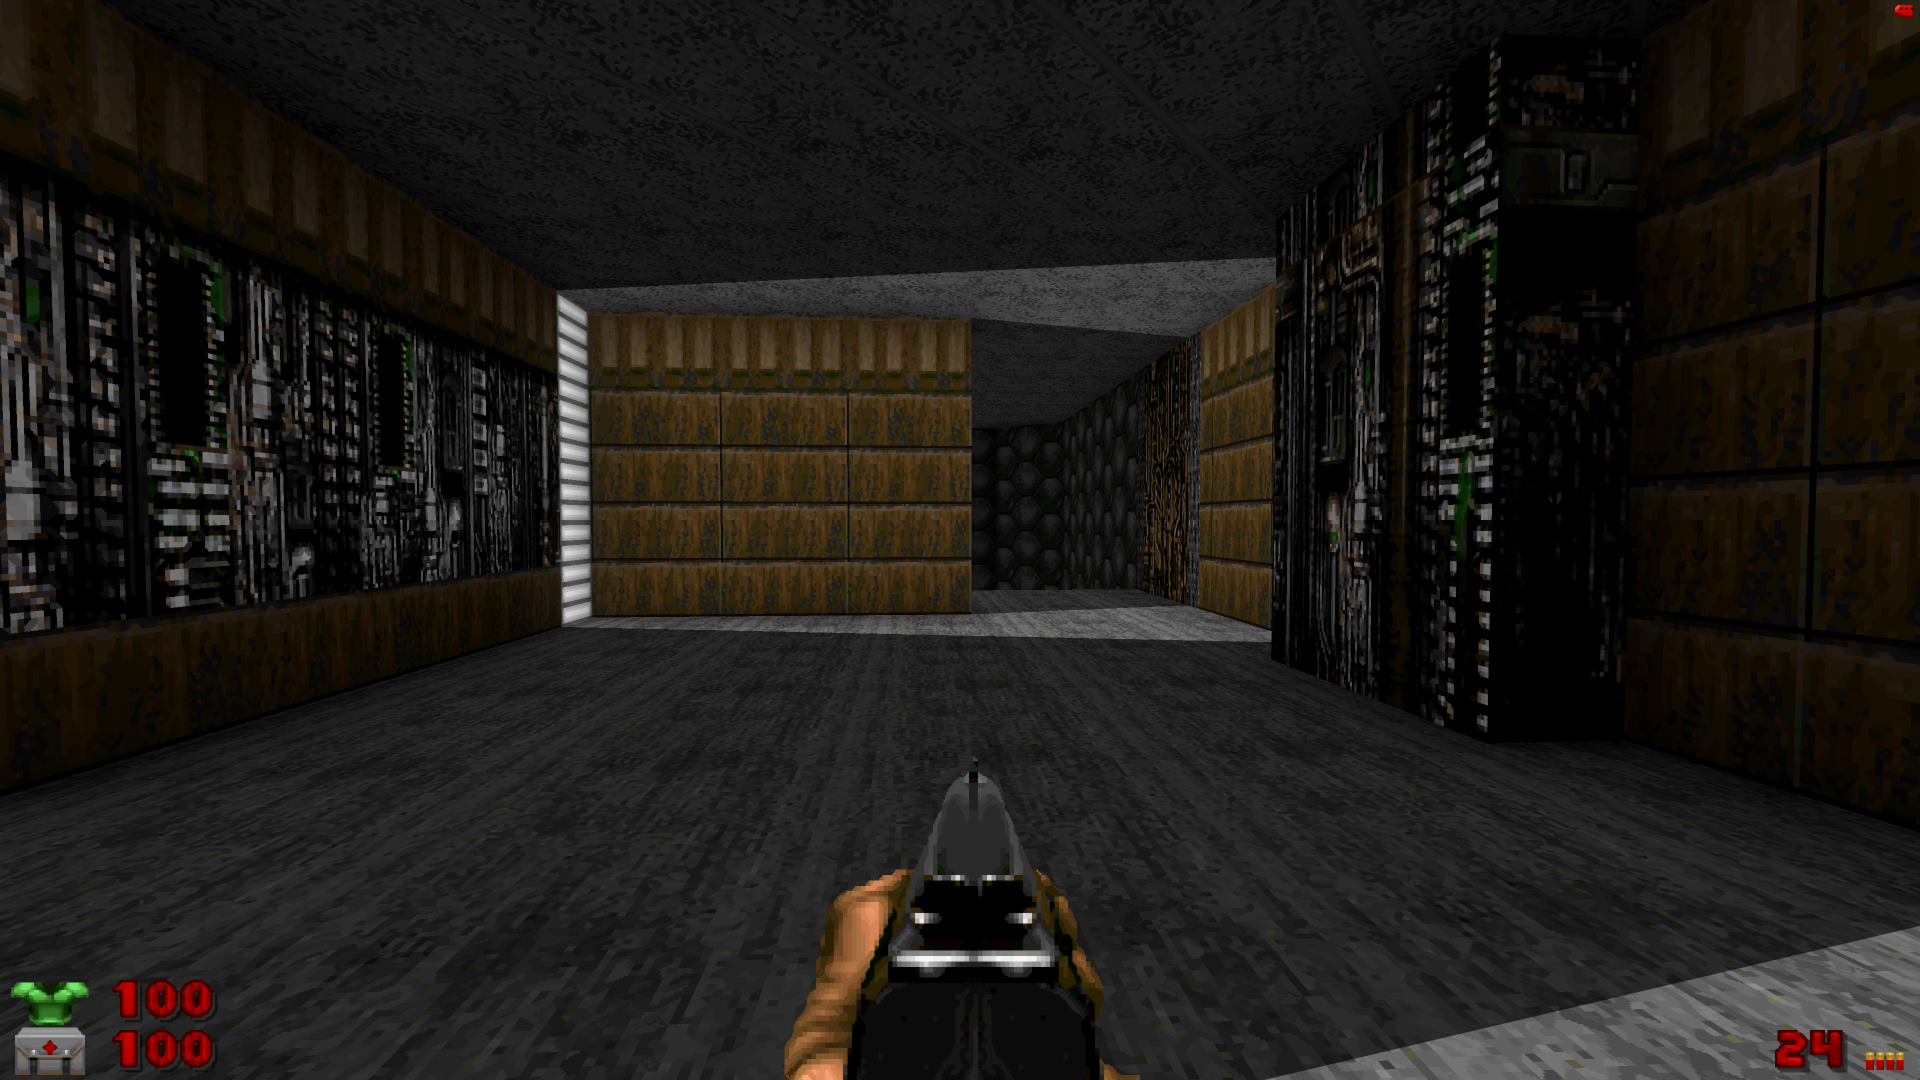 Screenshot_Doom_20210101_184831.png.1ec71a68e2c6677b8ed90faa7de9db9c.png